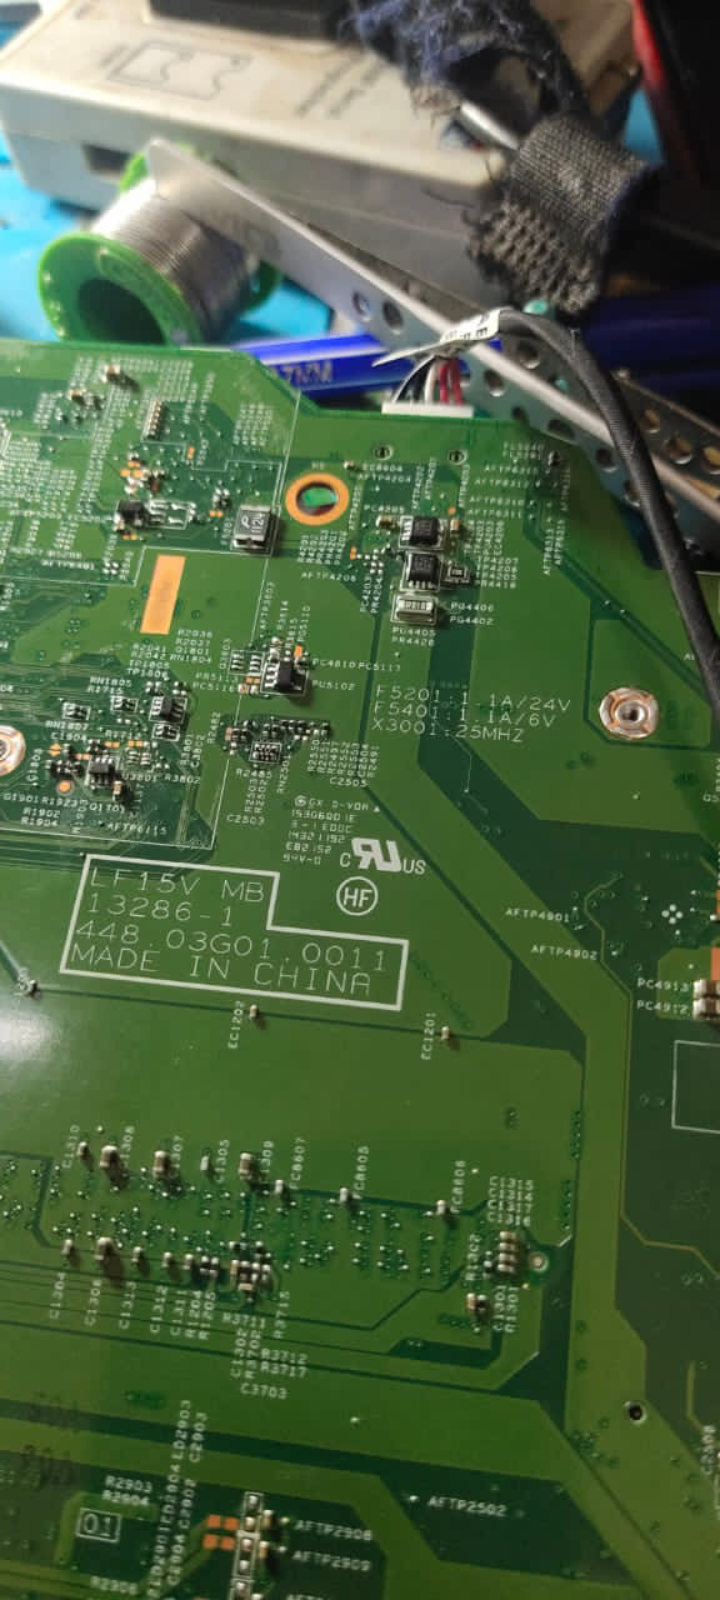 LENOVO LF15V MB 13286-1 448.03G01.0011 CLEAN ME BIOS 💯% WORKING